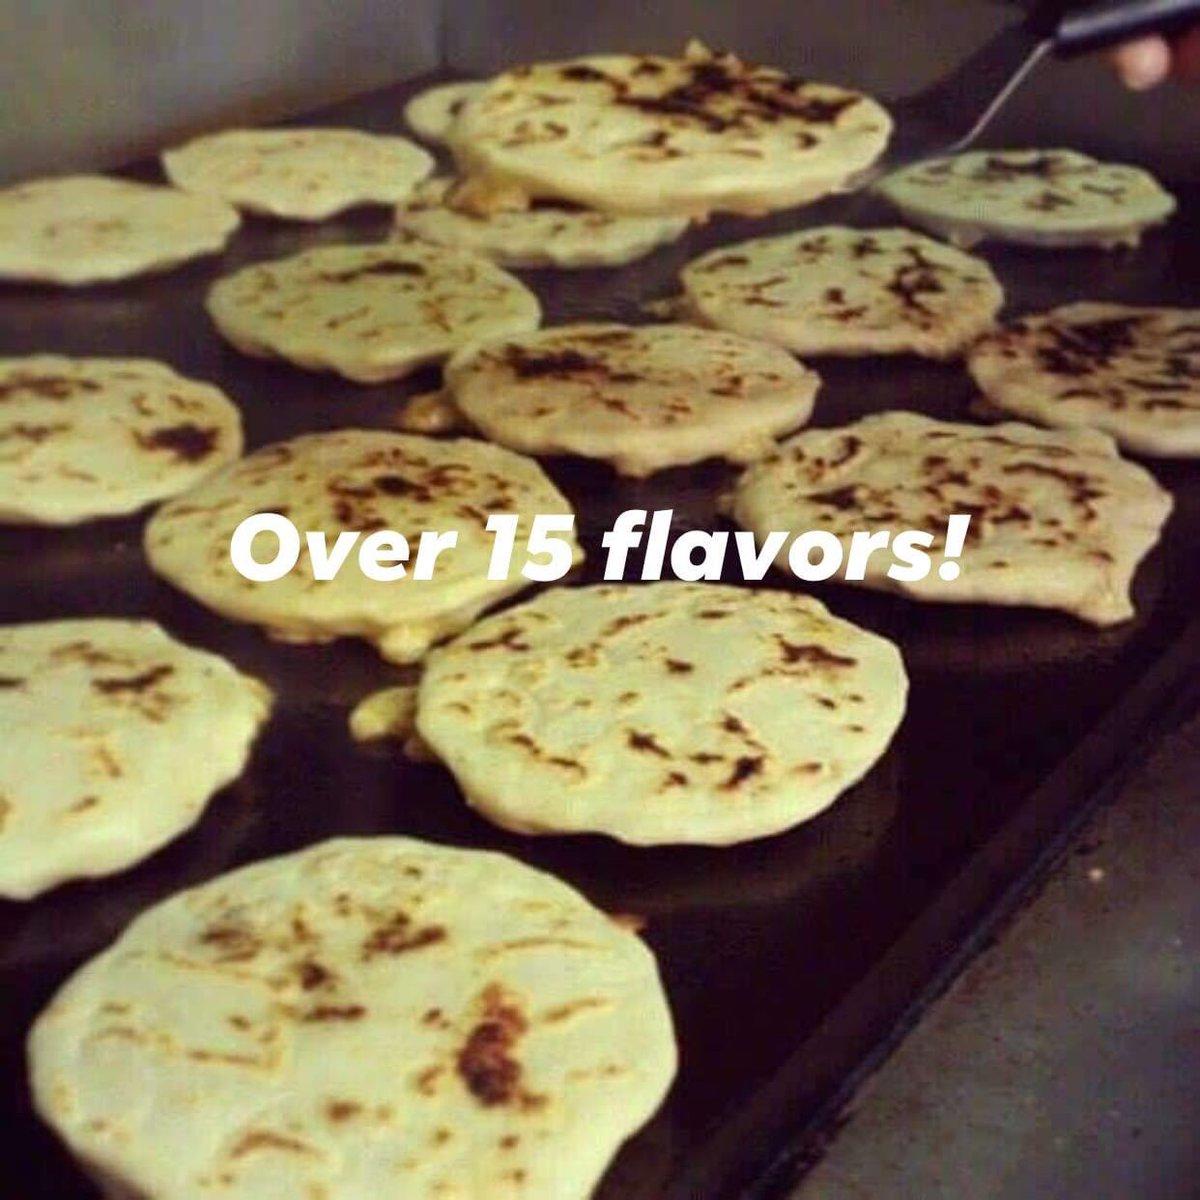 Delicious Pupusas & more!!!! Mesa Dr & Southern Ave!!! #Mesa #Arizonapic.twitter.com/ZmiEmyvPcz